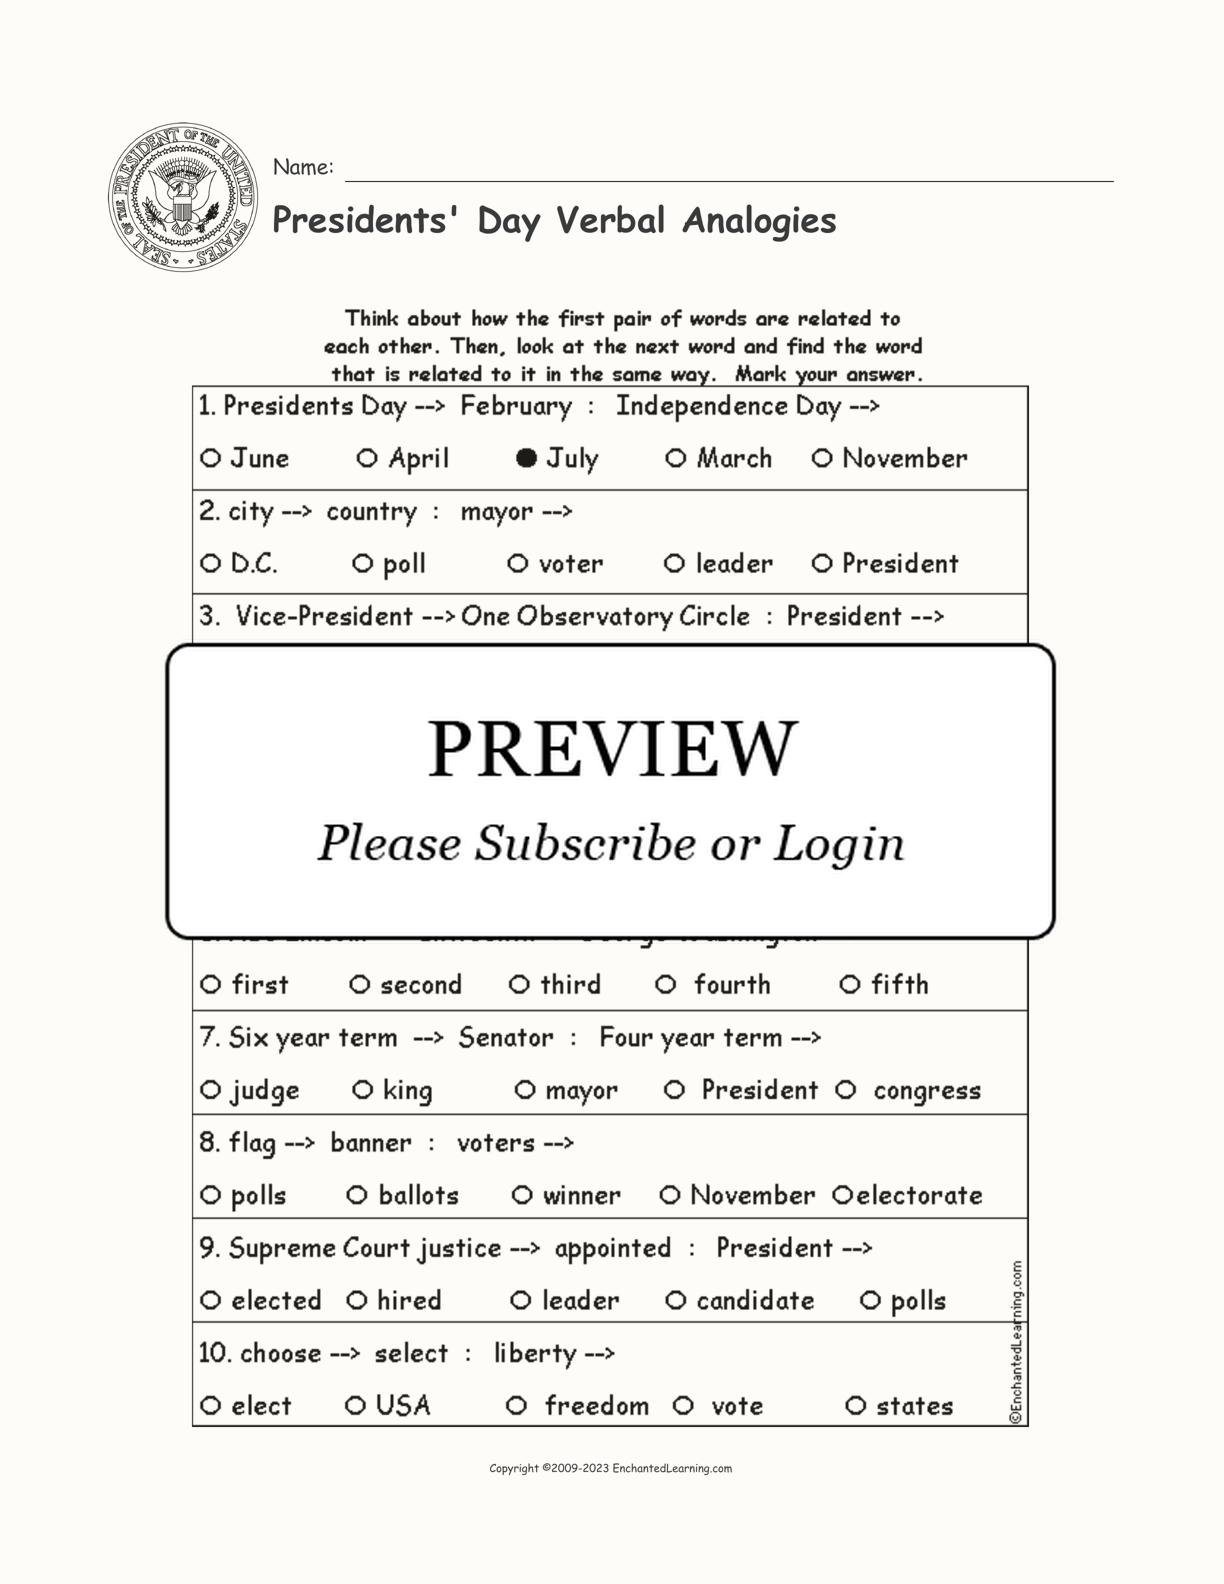 Presidents Day Verbalogies